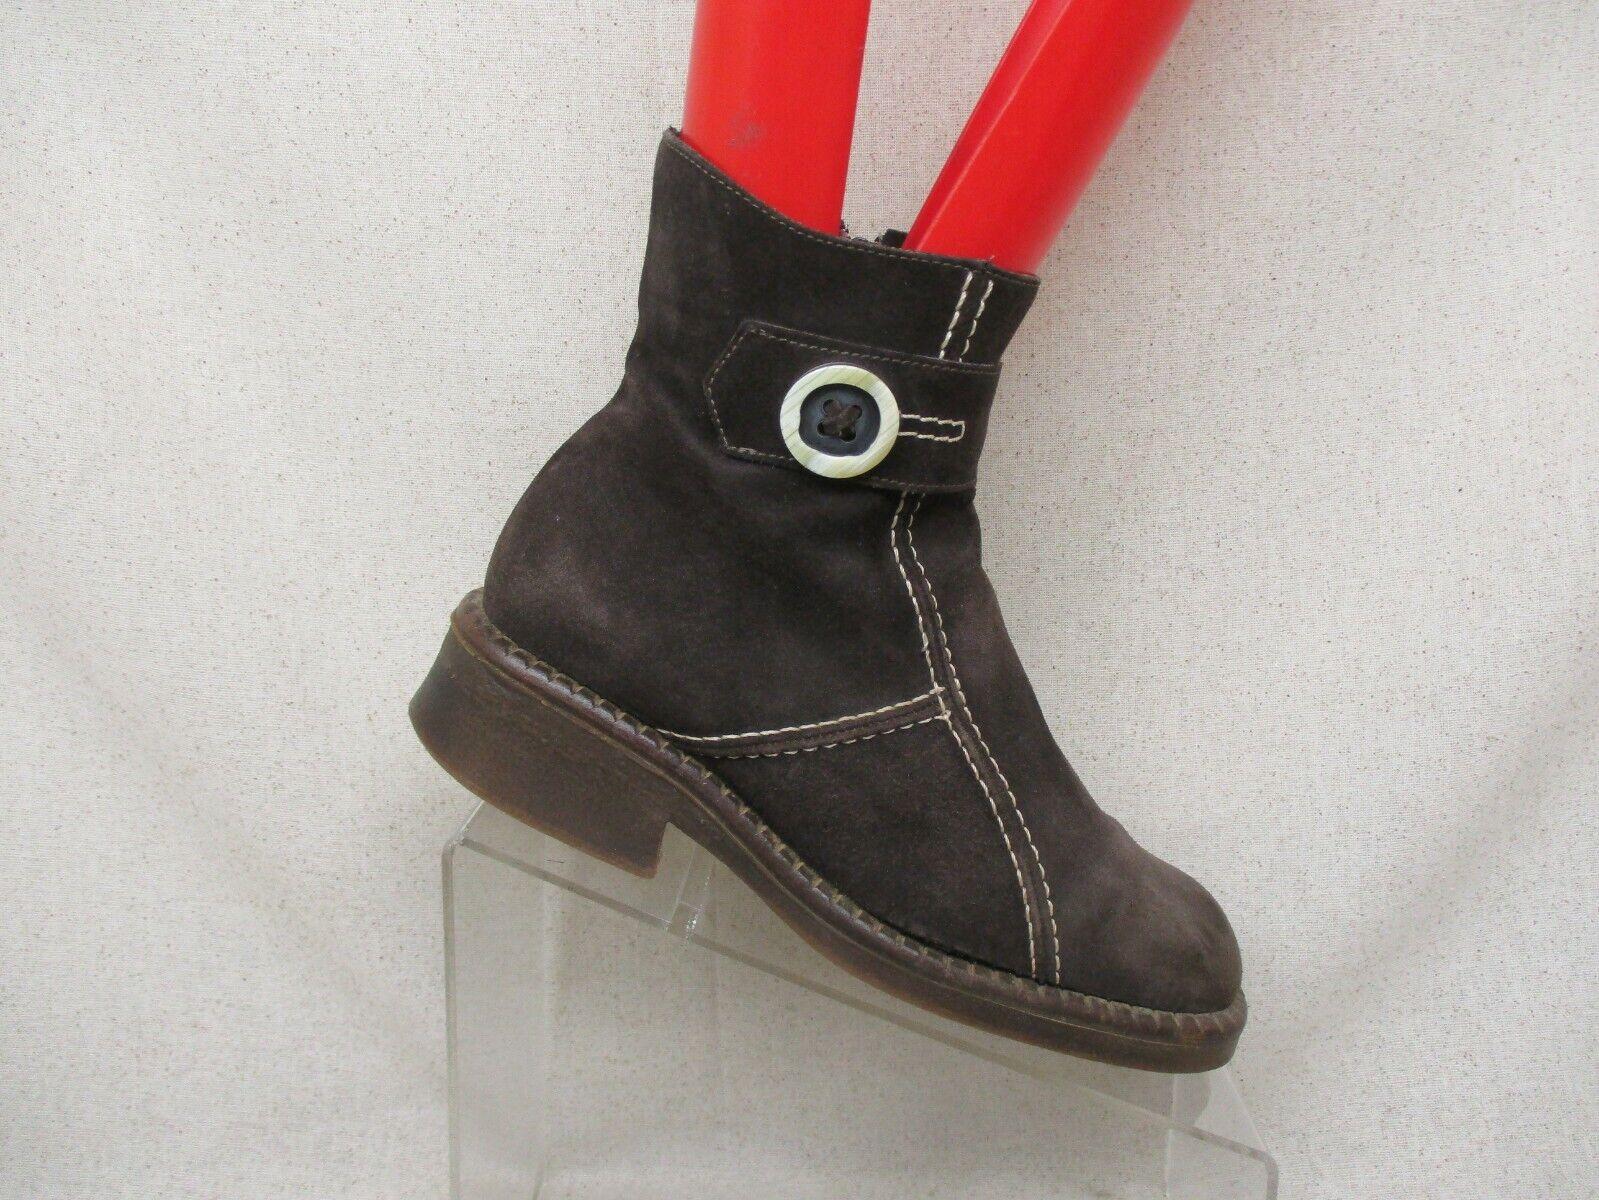 La Canadienne Gamuza Marrón botas al tobillo de moda de botón de Cremallera lateral Bota M